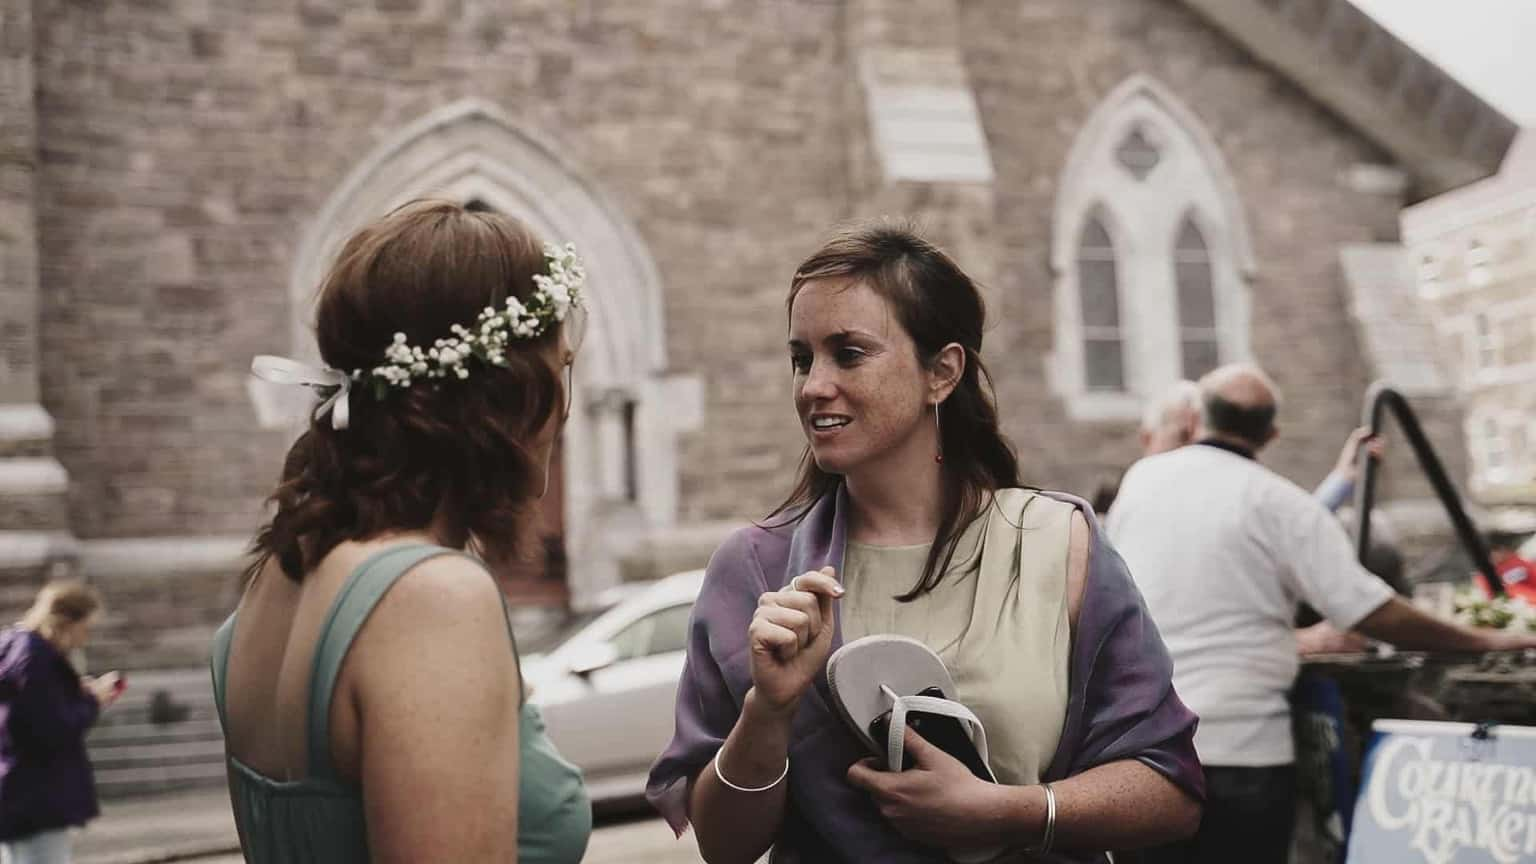 Brides maid hating